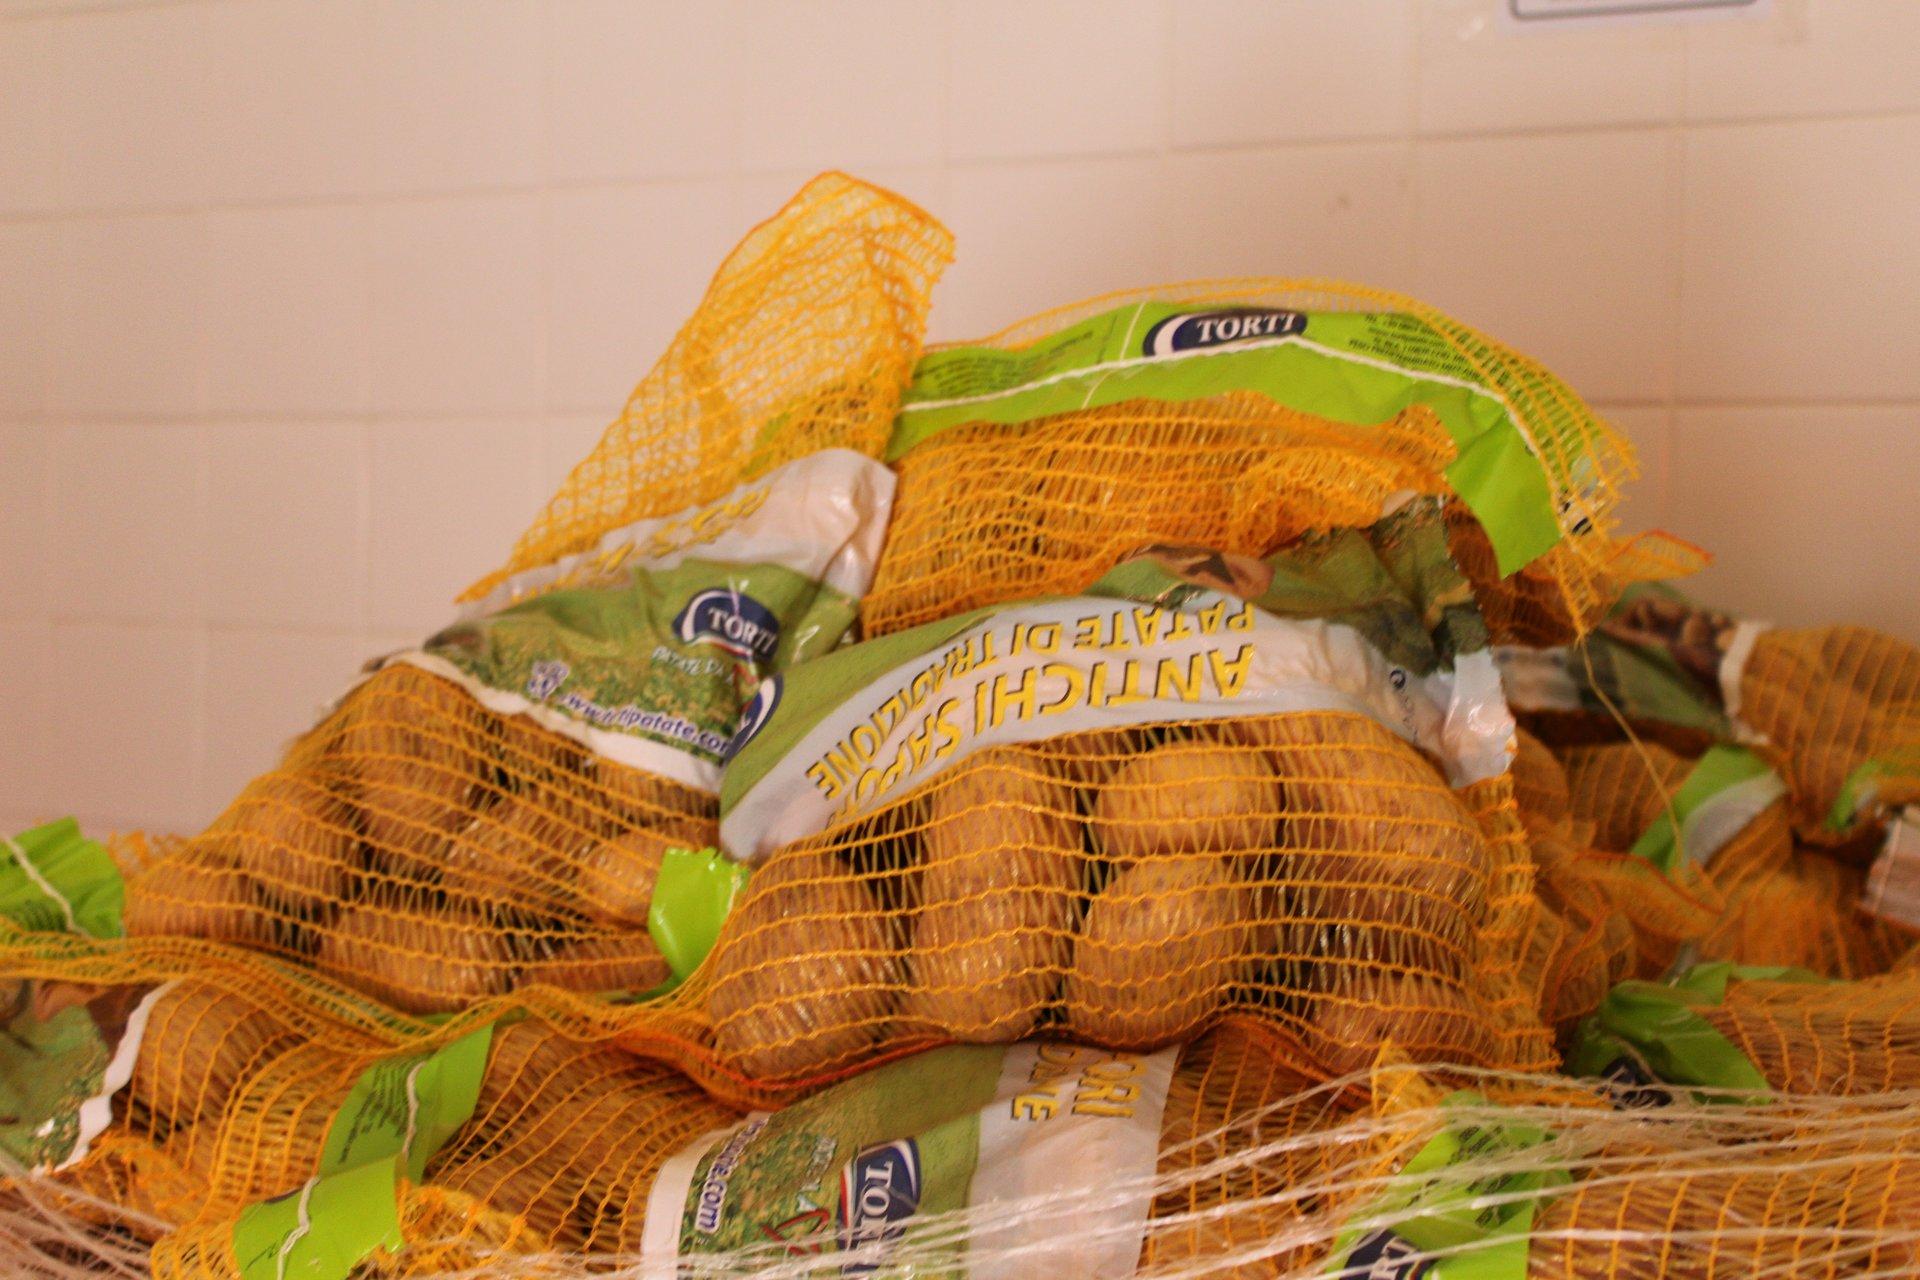 Sacchi di patate